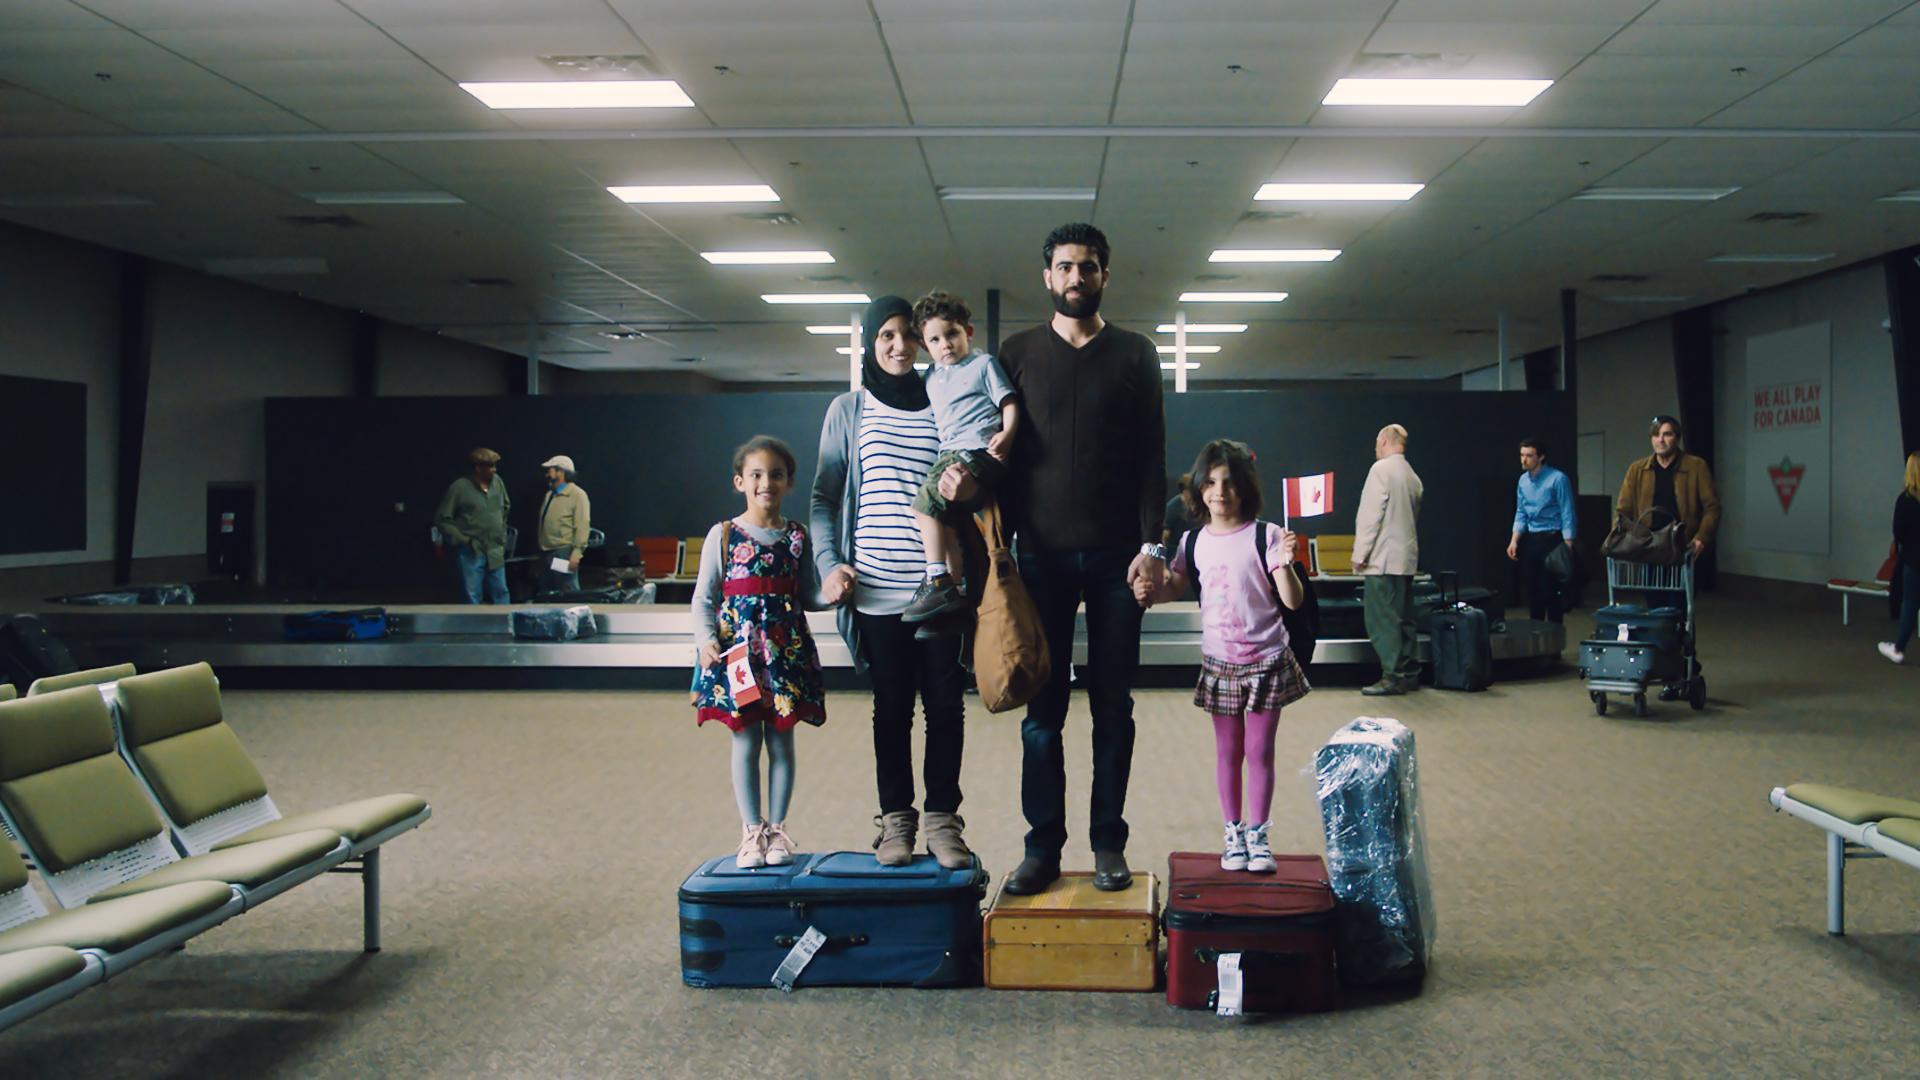 Pedestal_SyrianFamily_Still